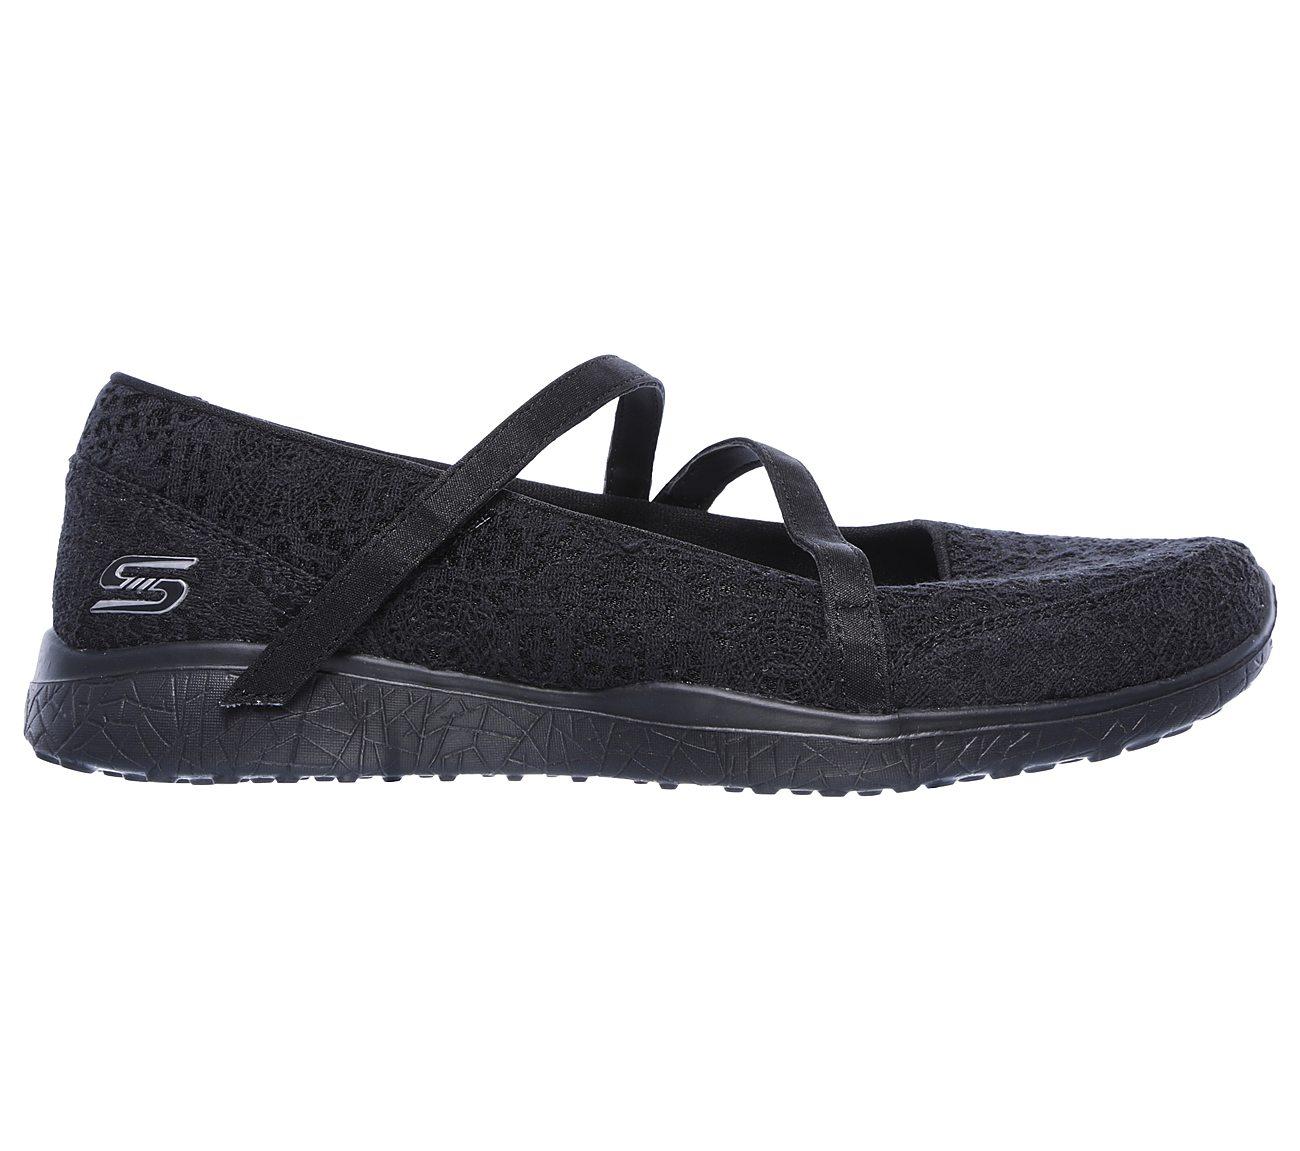 Skechers Microburst Pure ... Elegance Women's Shoes 9XzUhscS6D